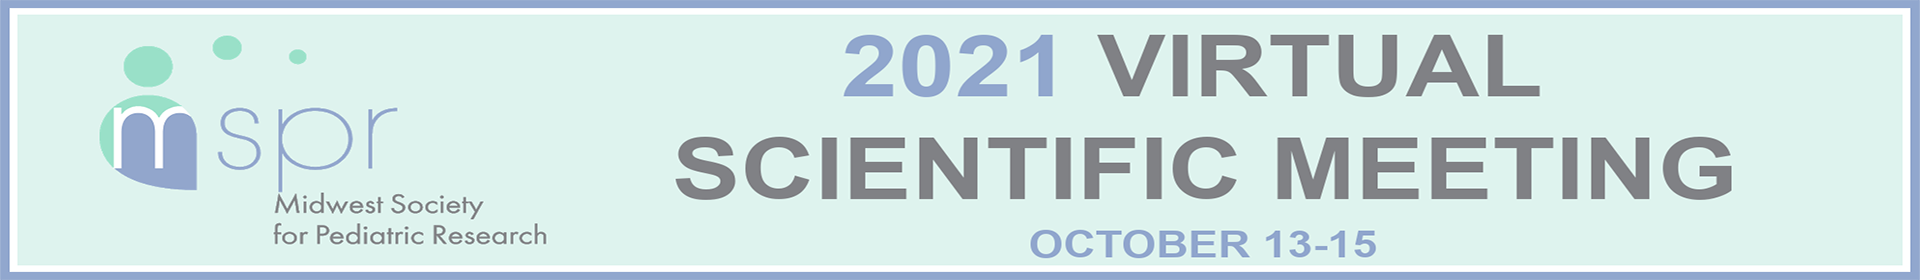 MSPR 2021 Virtual Scientific Meeting Event Banner